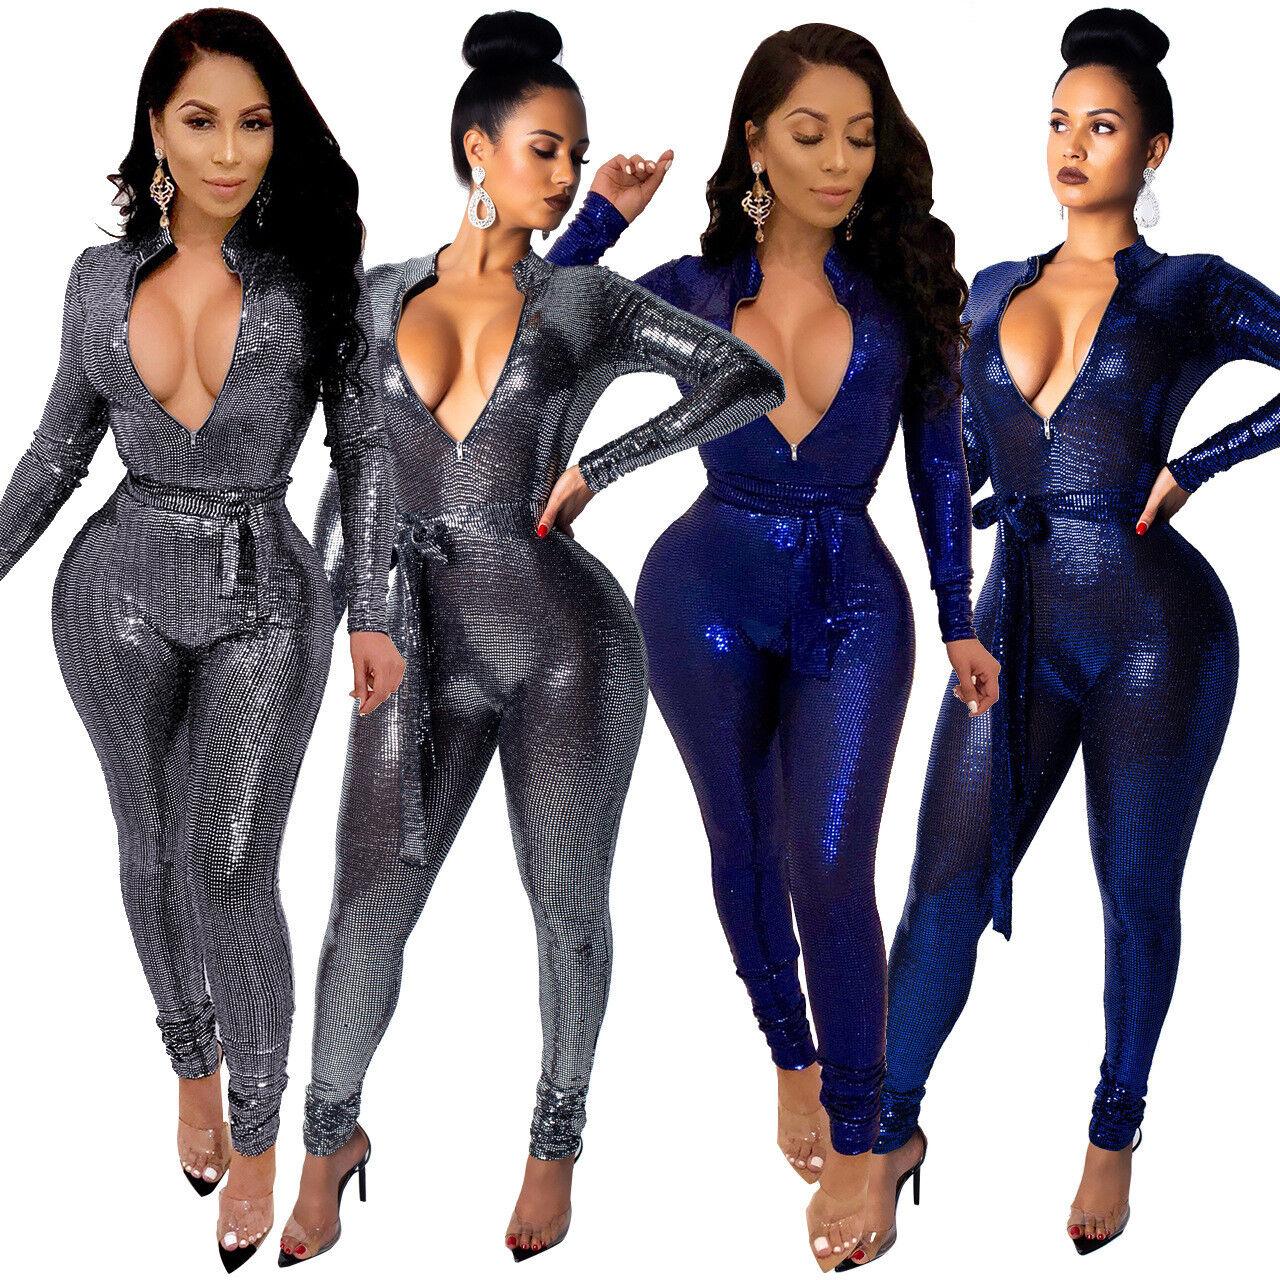 71ec73357a1 Details about 2019New Women Long Sleeve Solid Sequins Zipper Bodycon Club  Party Belt Jumpsuit